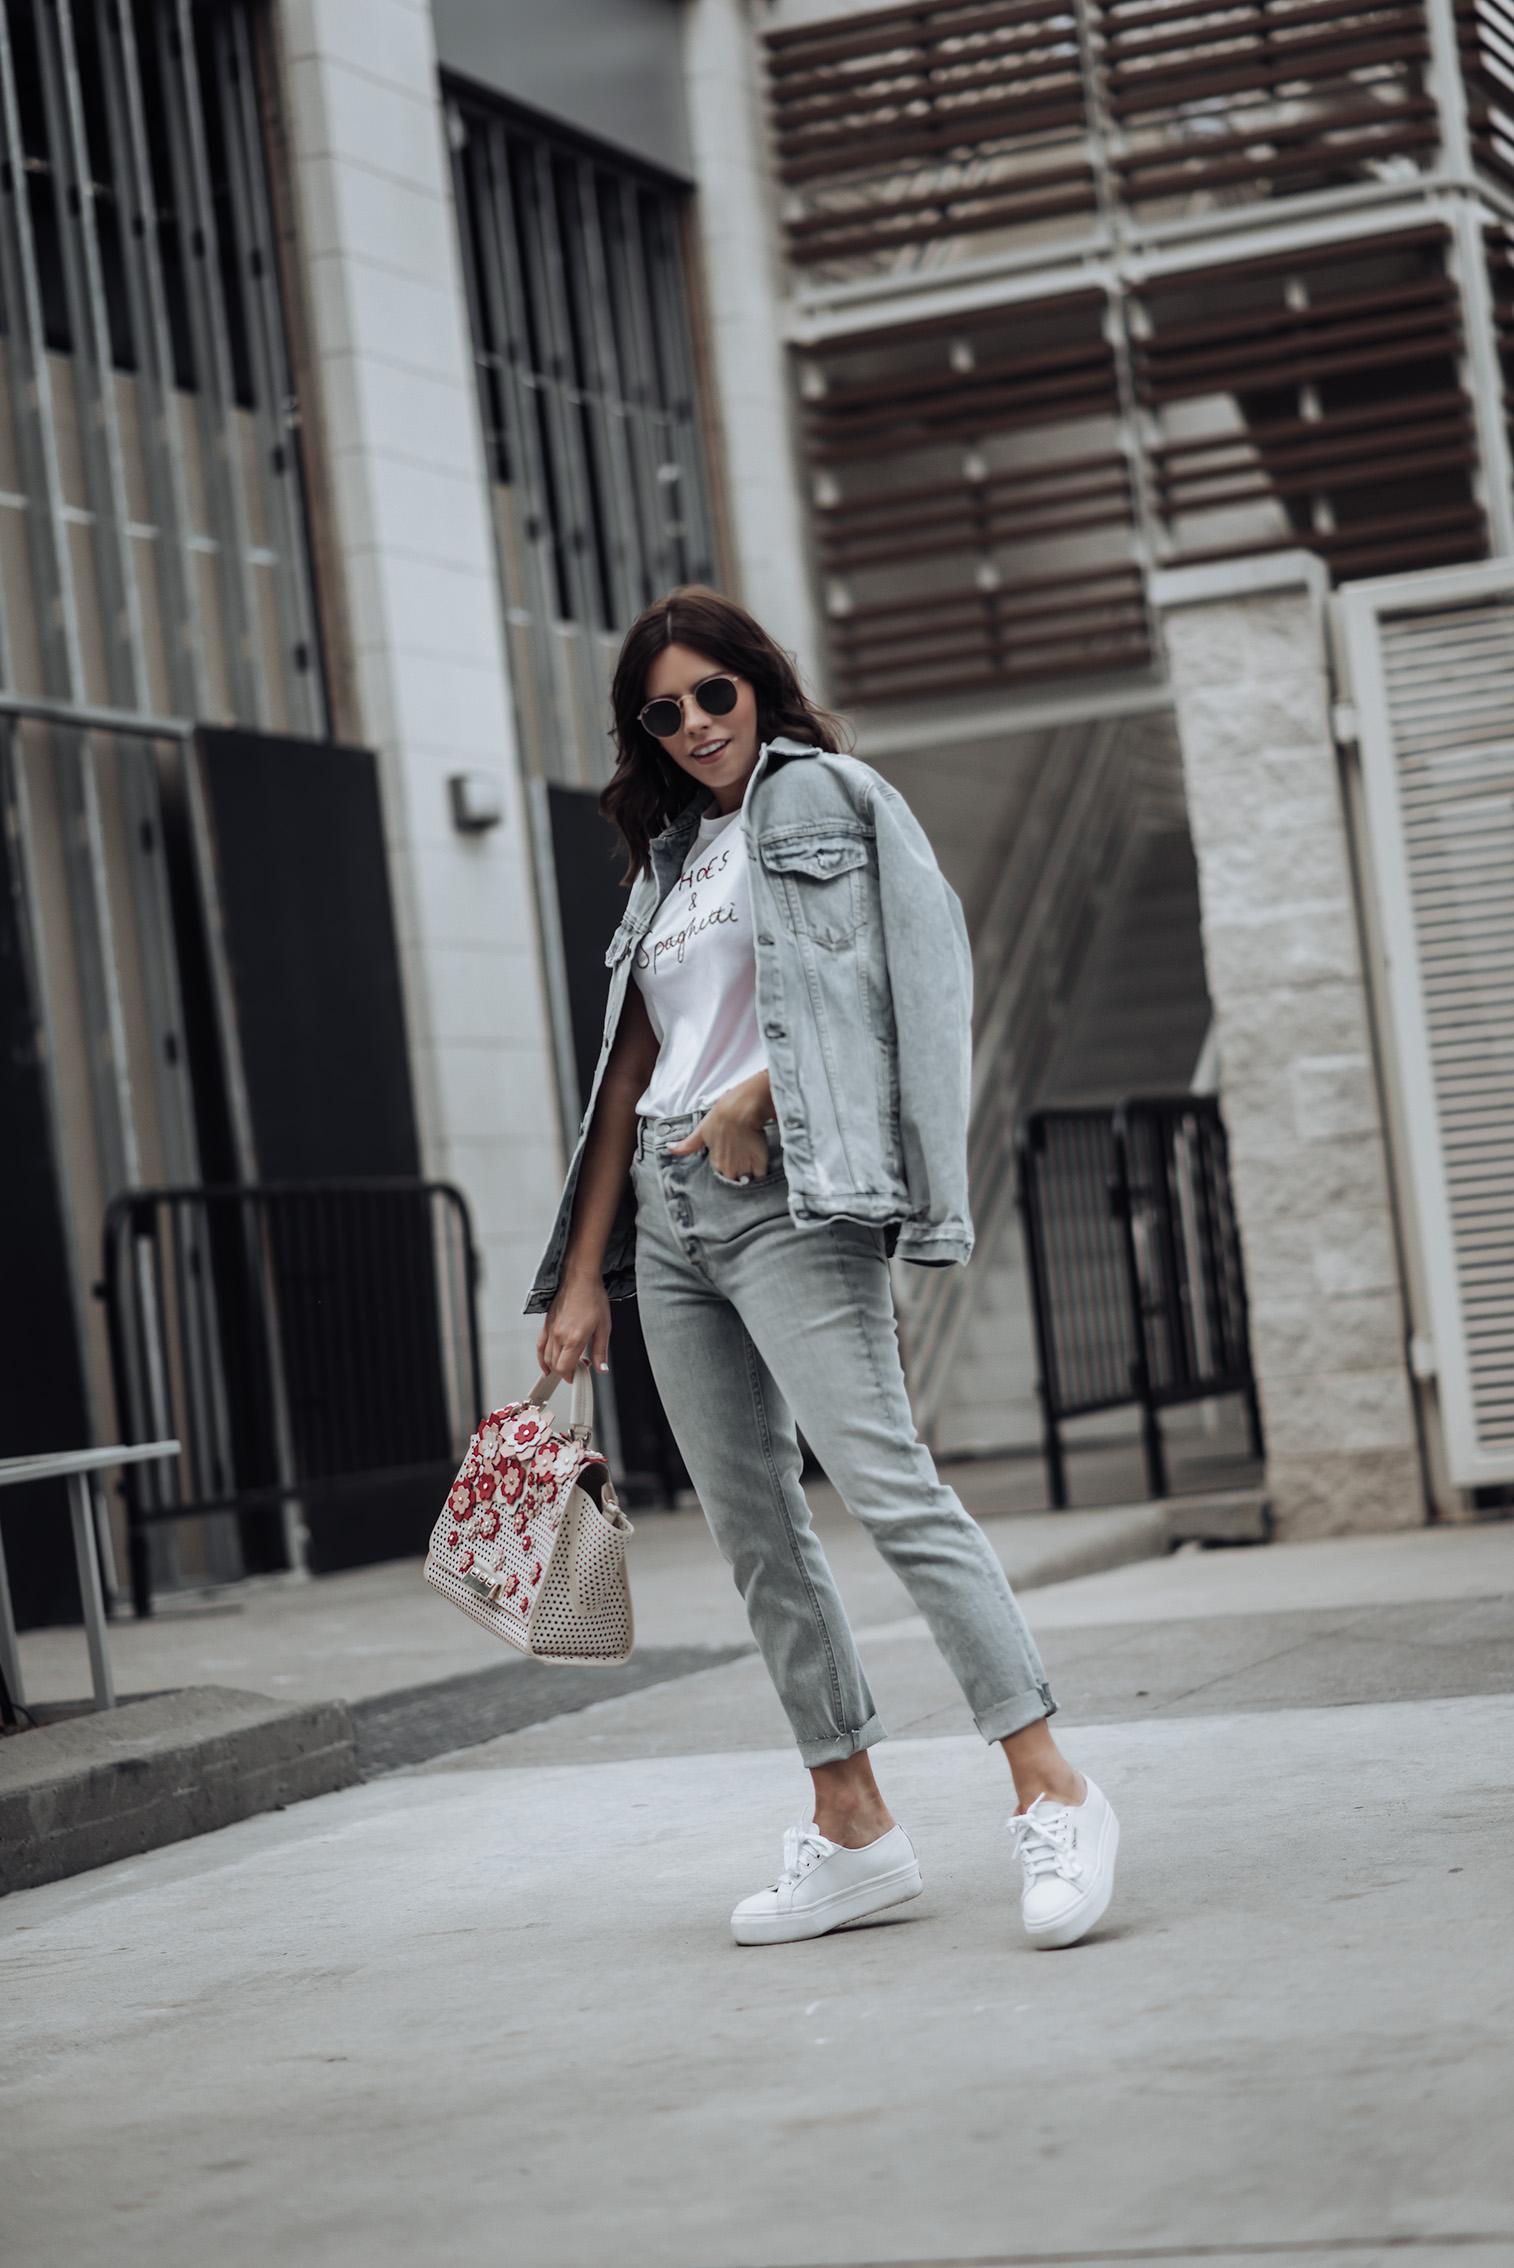 {C/O} GRLFRND Karolina Jeans | {C/O}GRLFRND Daria Denim Jacket | Zac Posen Bag | Shoes & Spaghetti T-Shirt | Superga Platform Sneakers | #streetstyle #liketkit #Revolve #denimoutfits